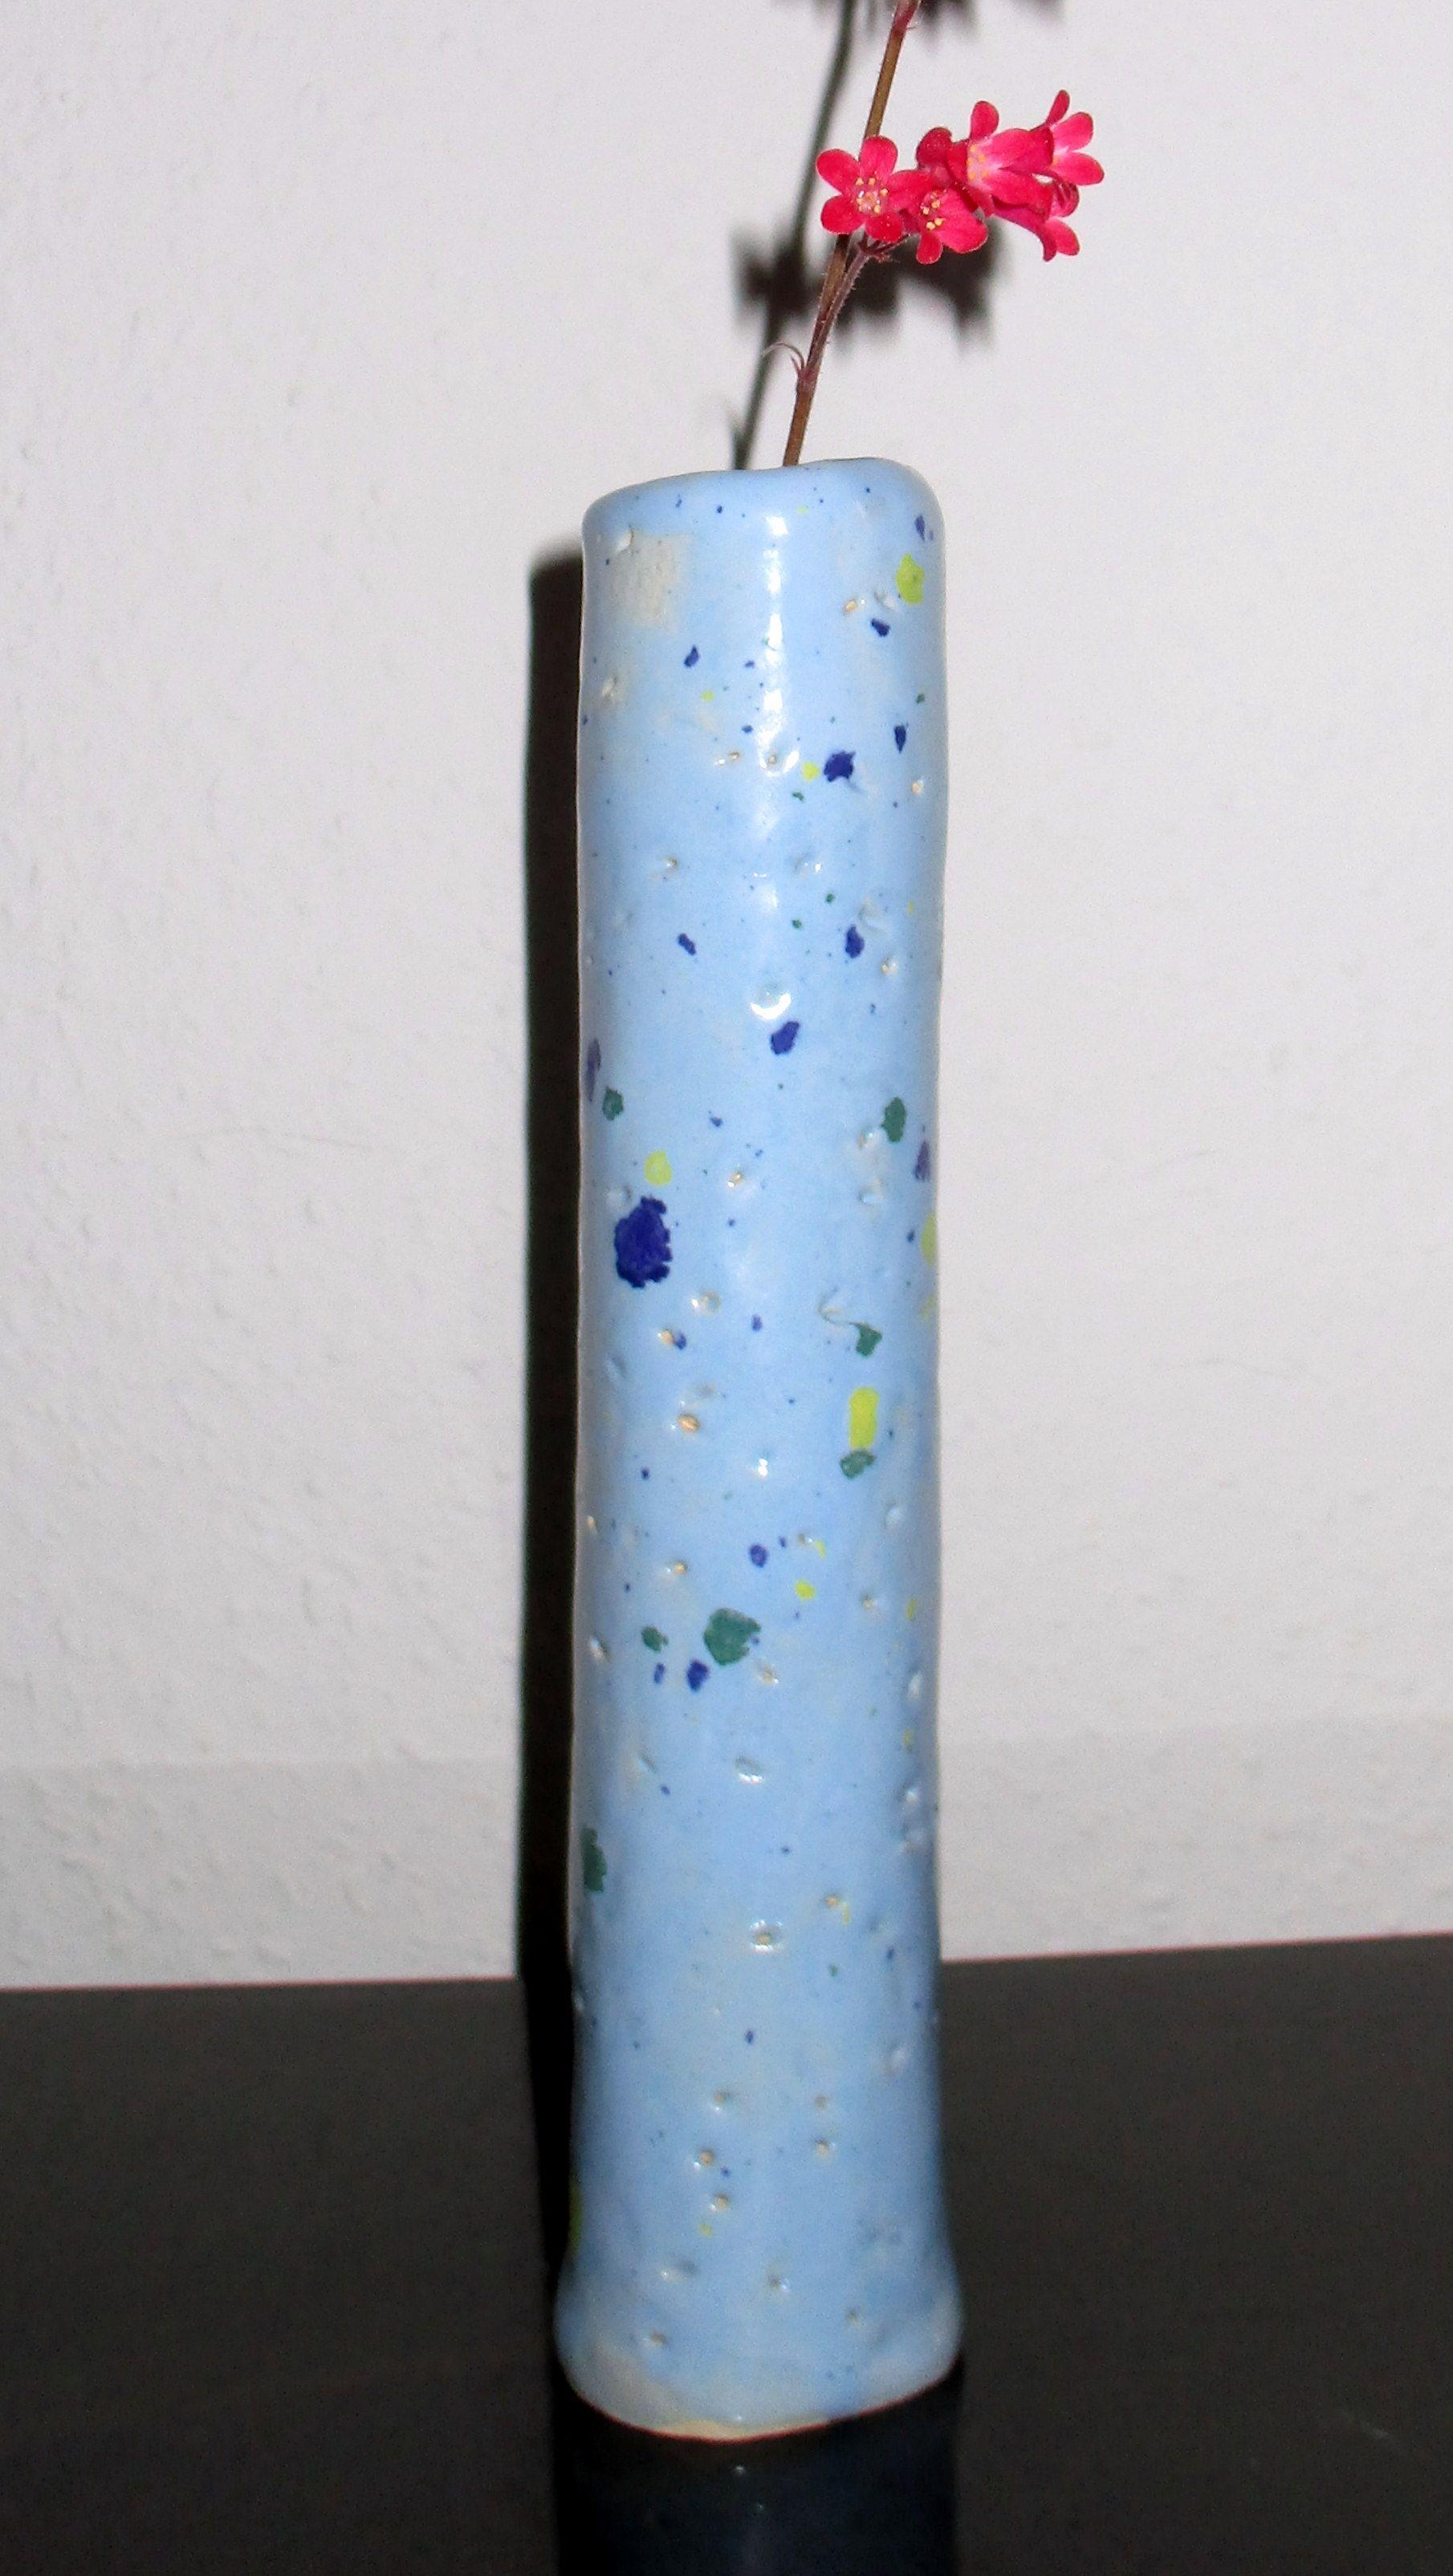 Blumenvase aus Keramik